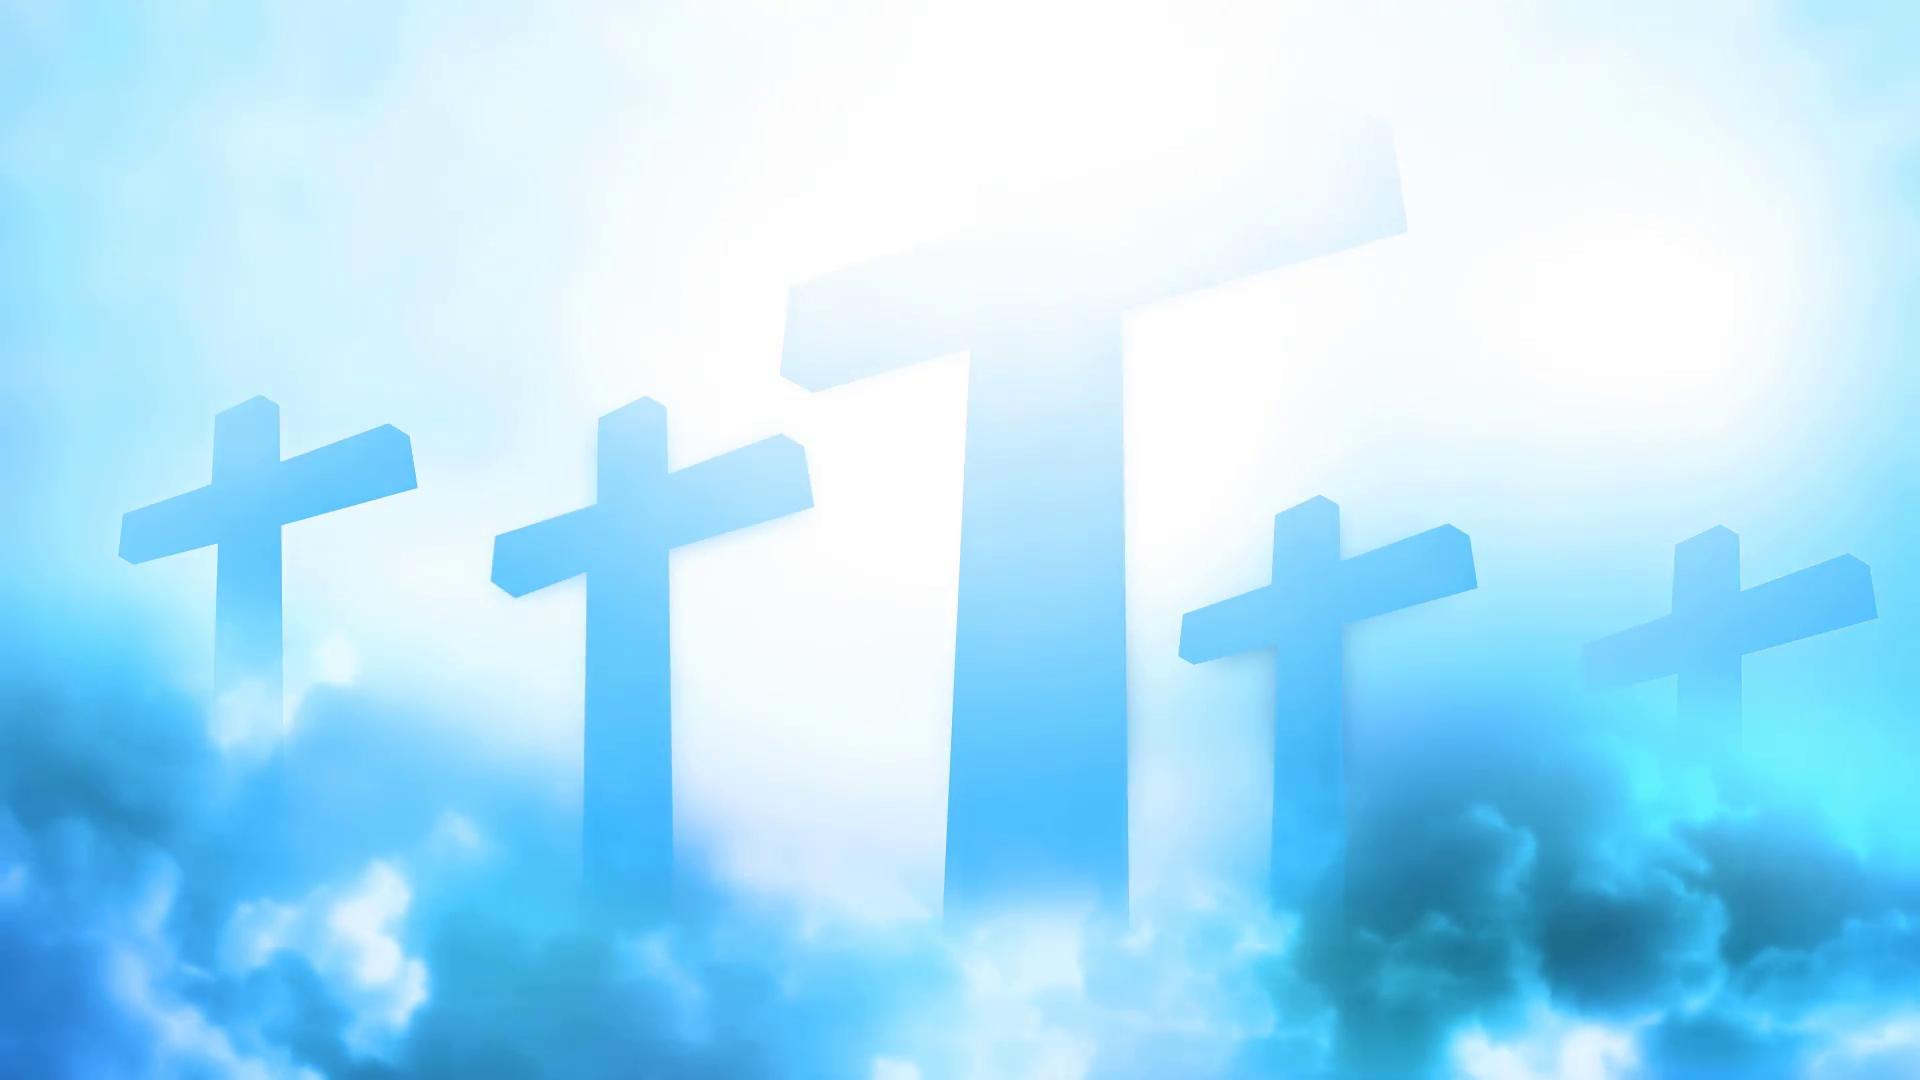 heavenly cross animated background motion background - videoblocks